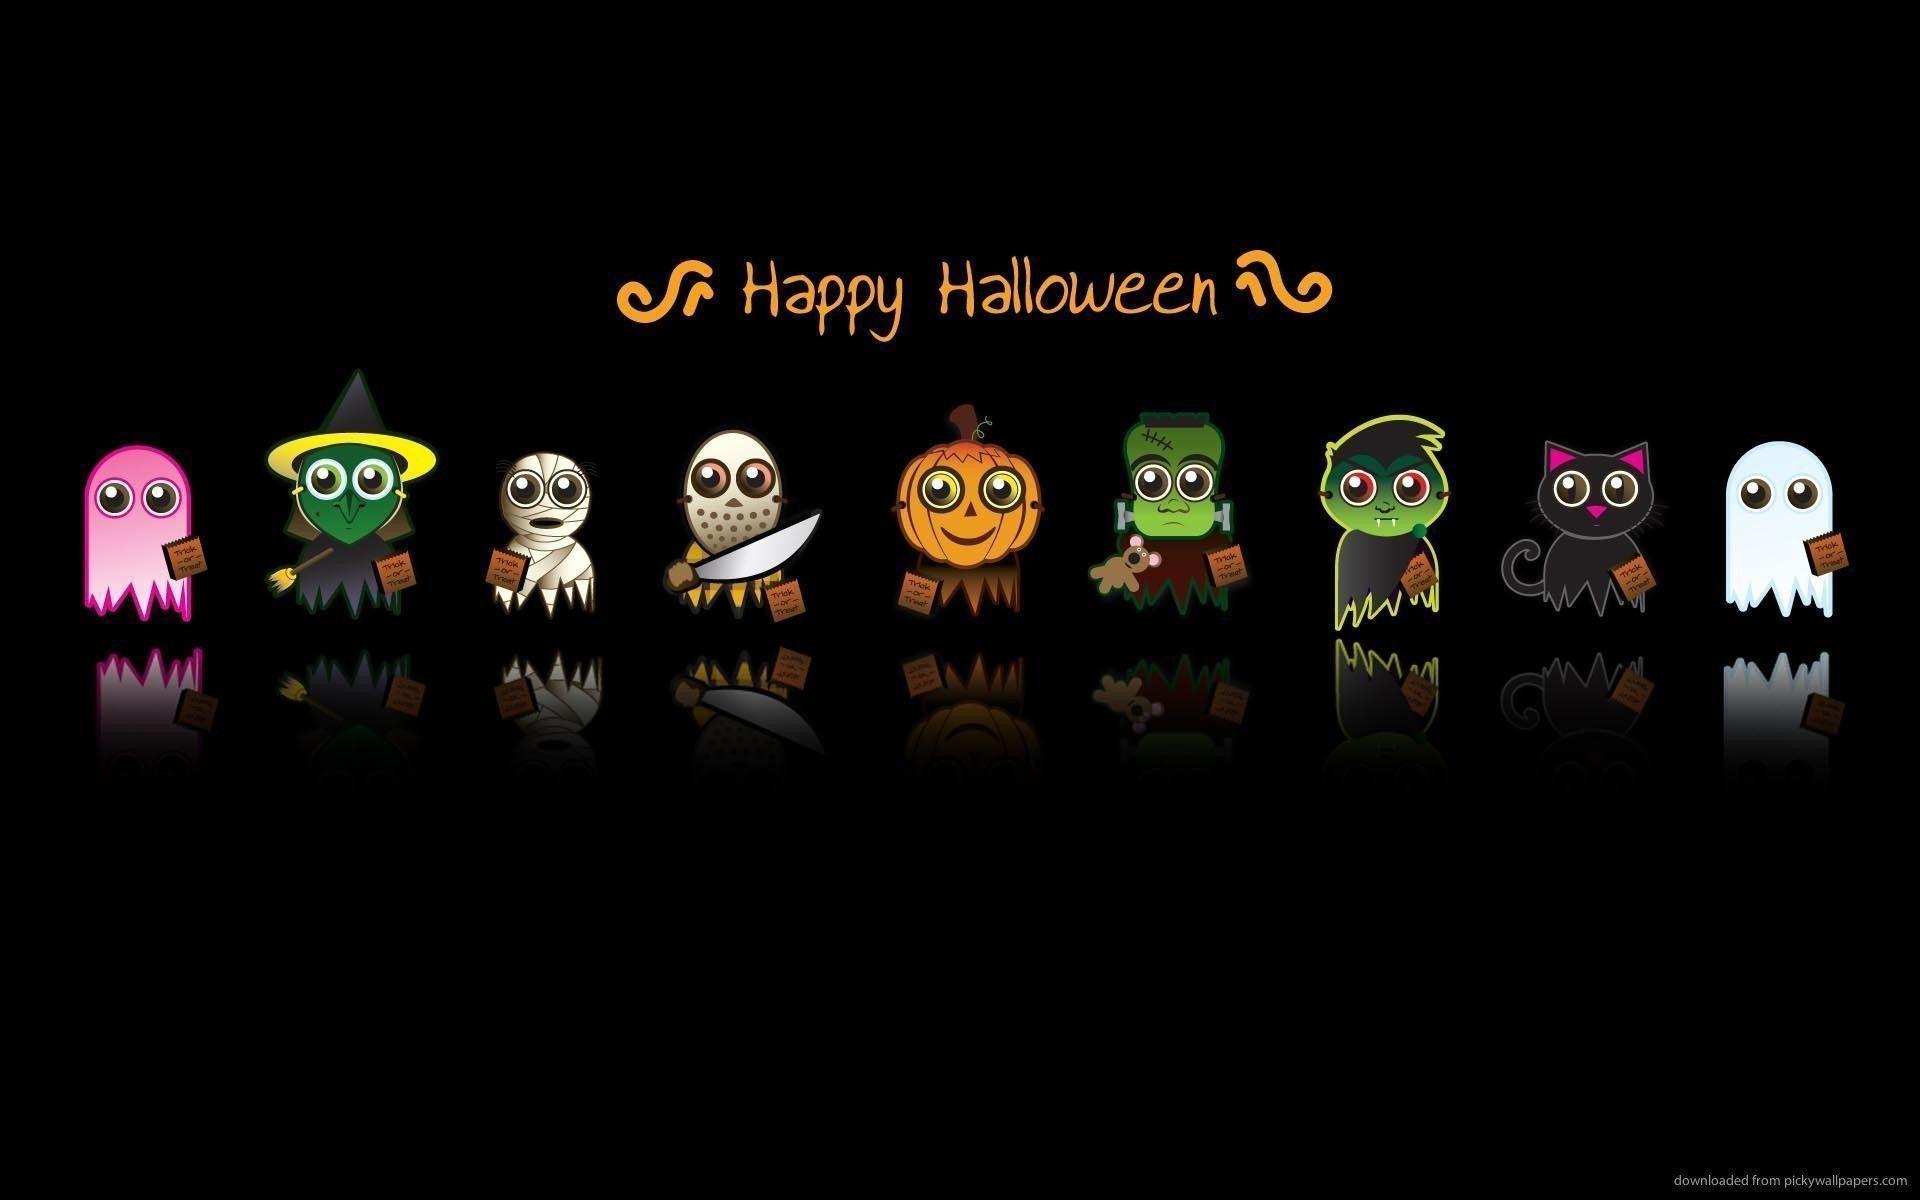 Funny Halloween Wallpaper (59+ images)